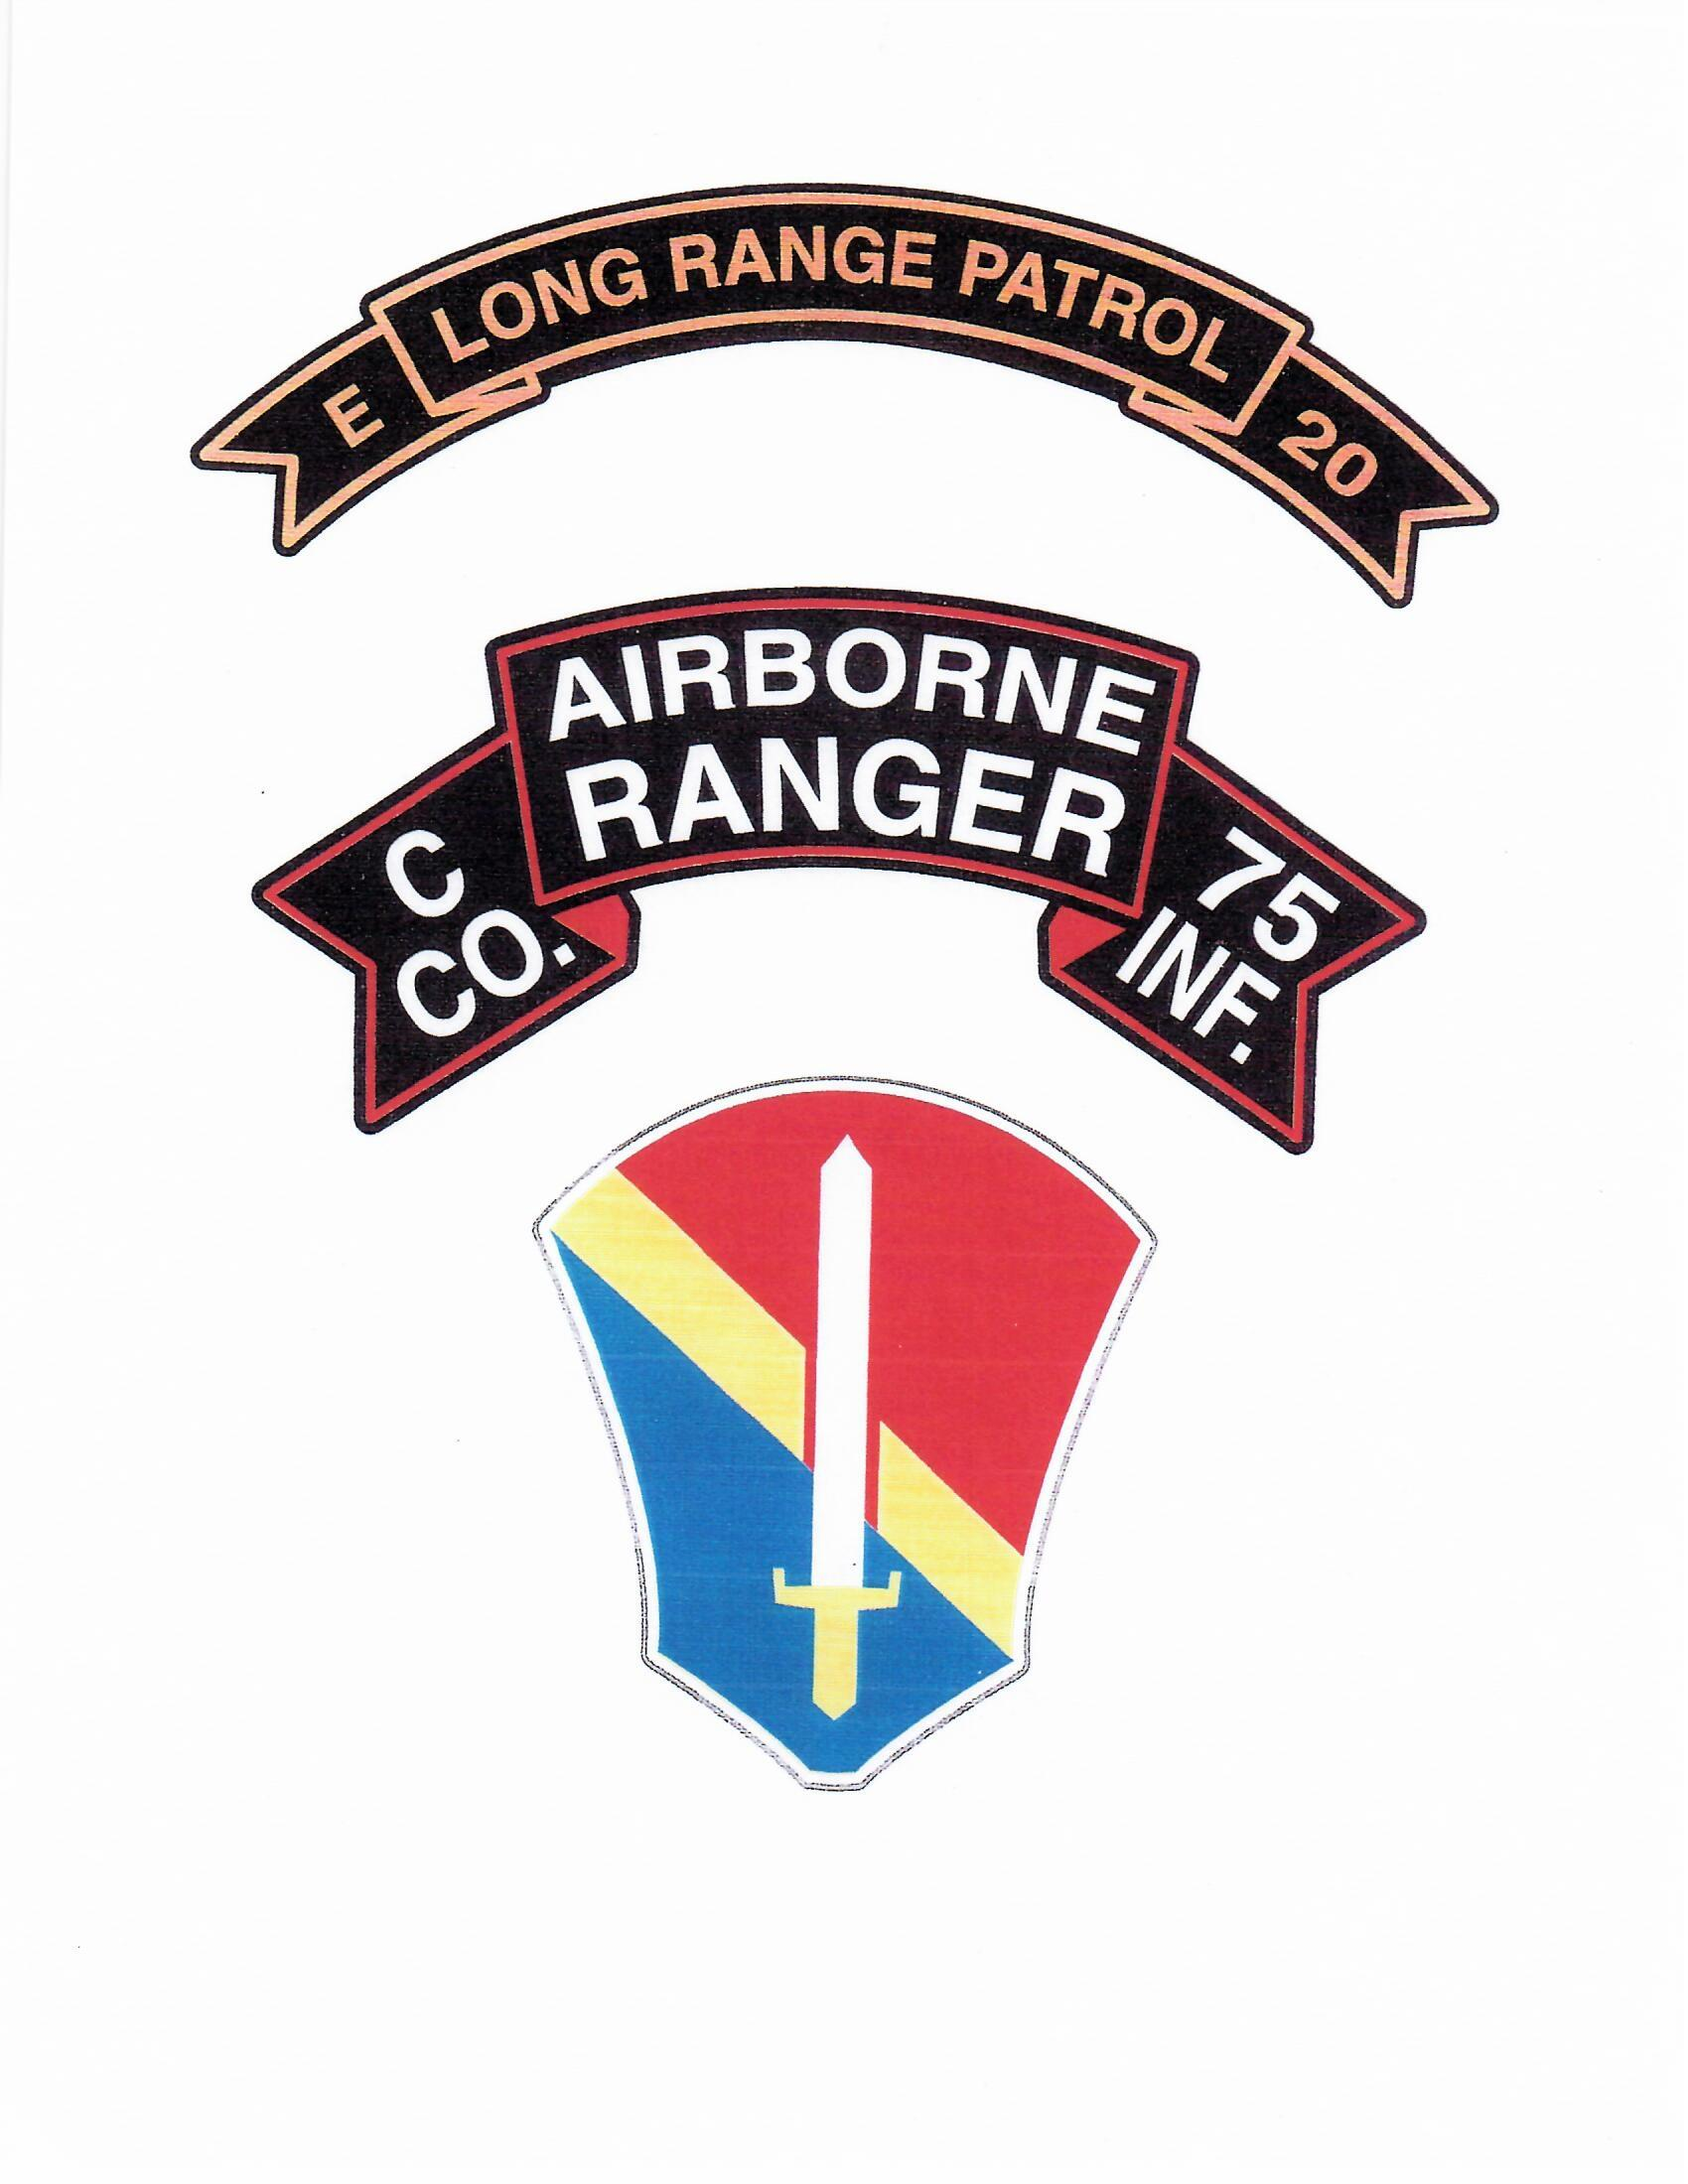 Team 1-6, Charlie Rangers